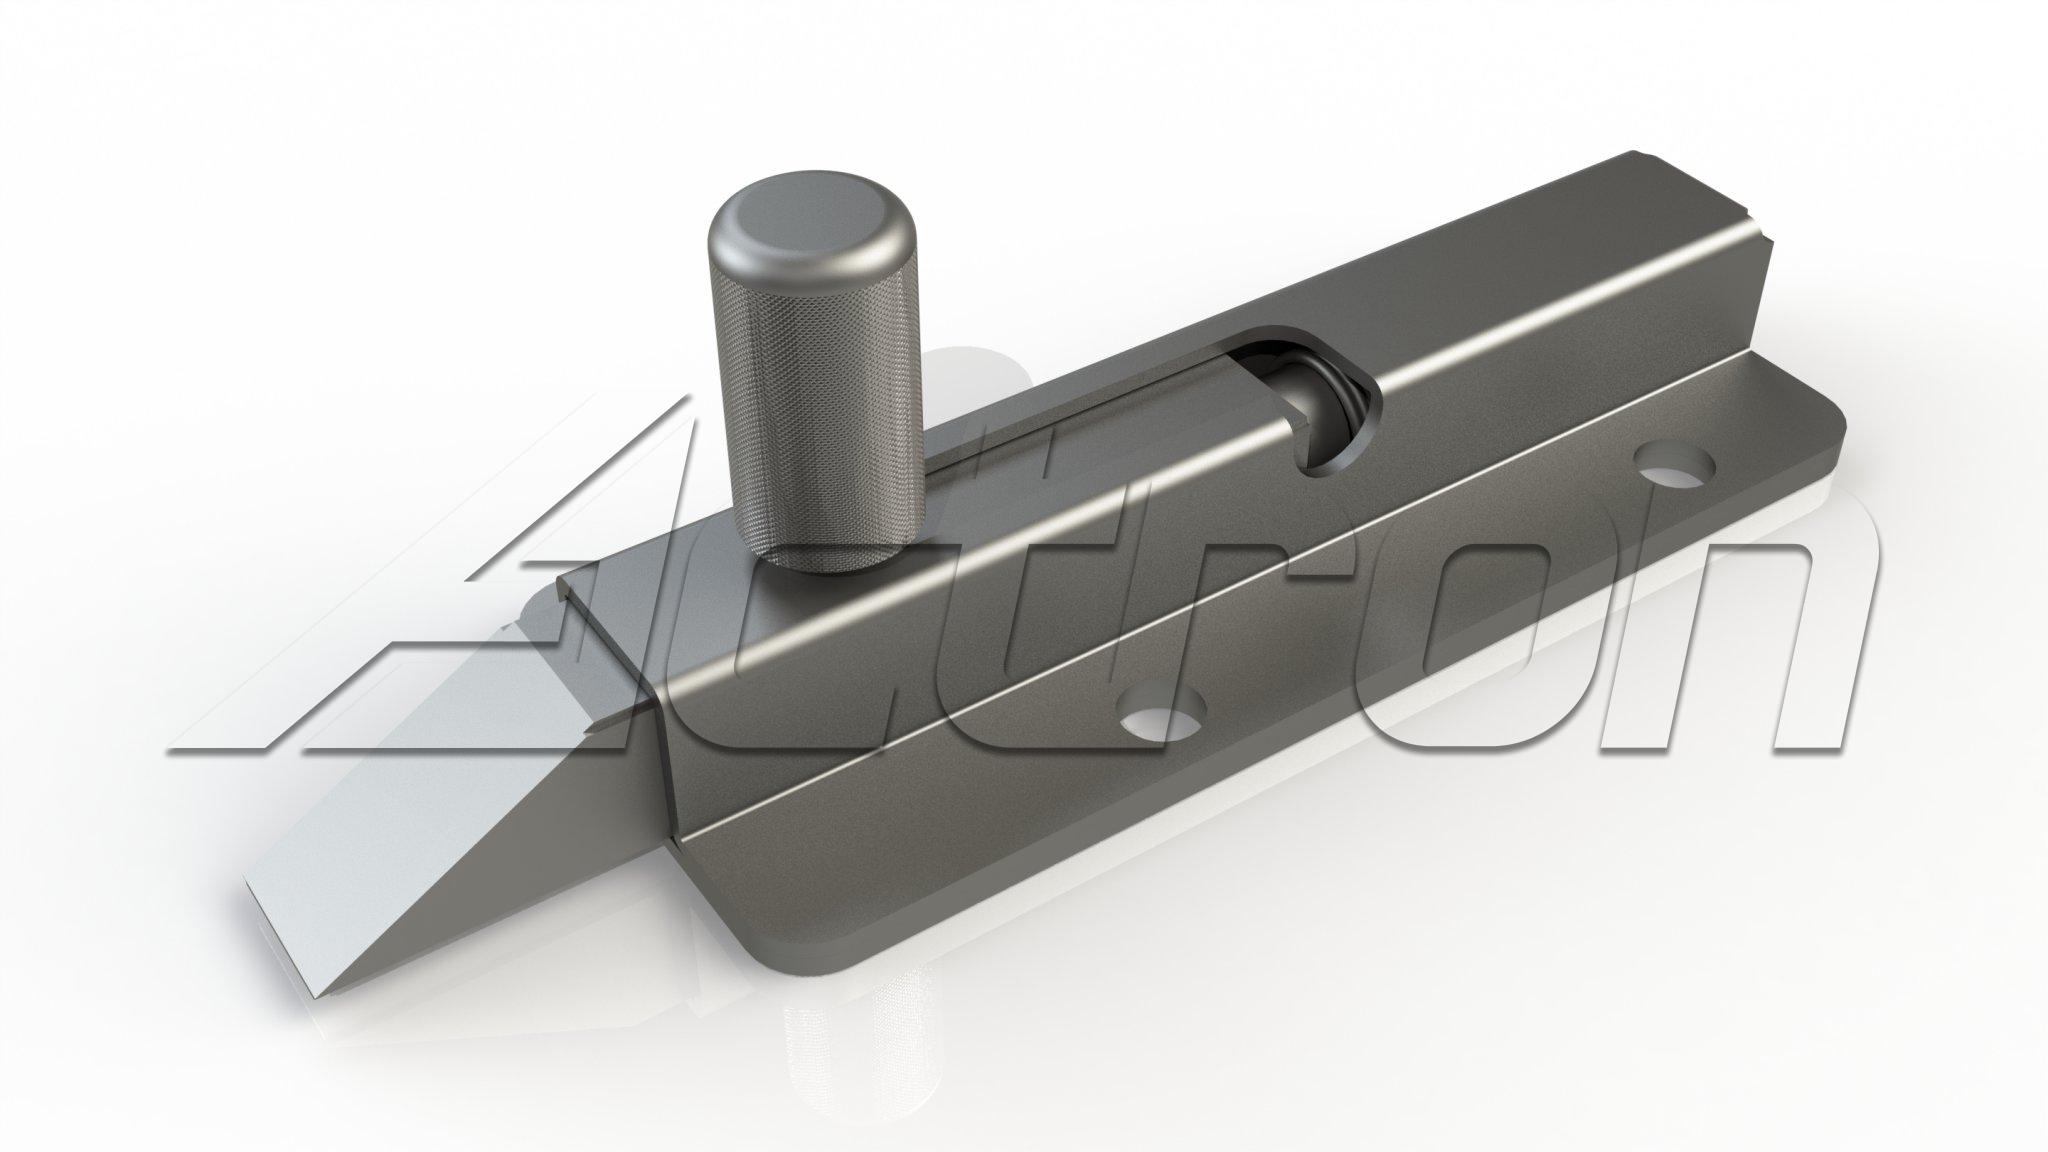 latch-assy-8211-sliding-3948-a2075.jpg